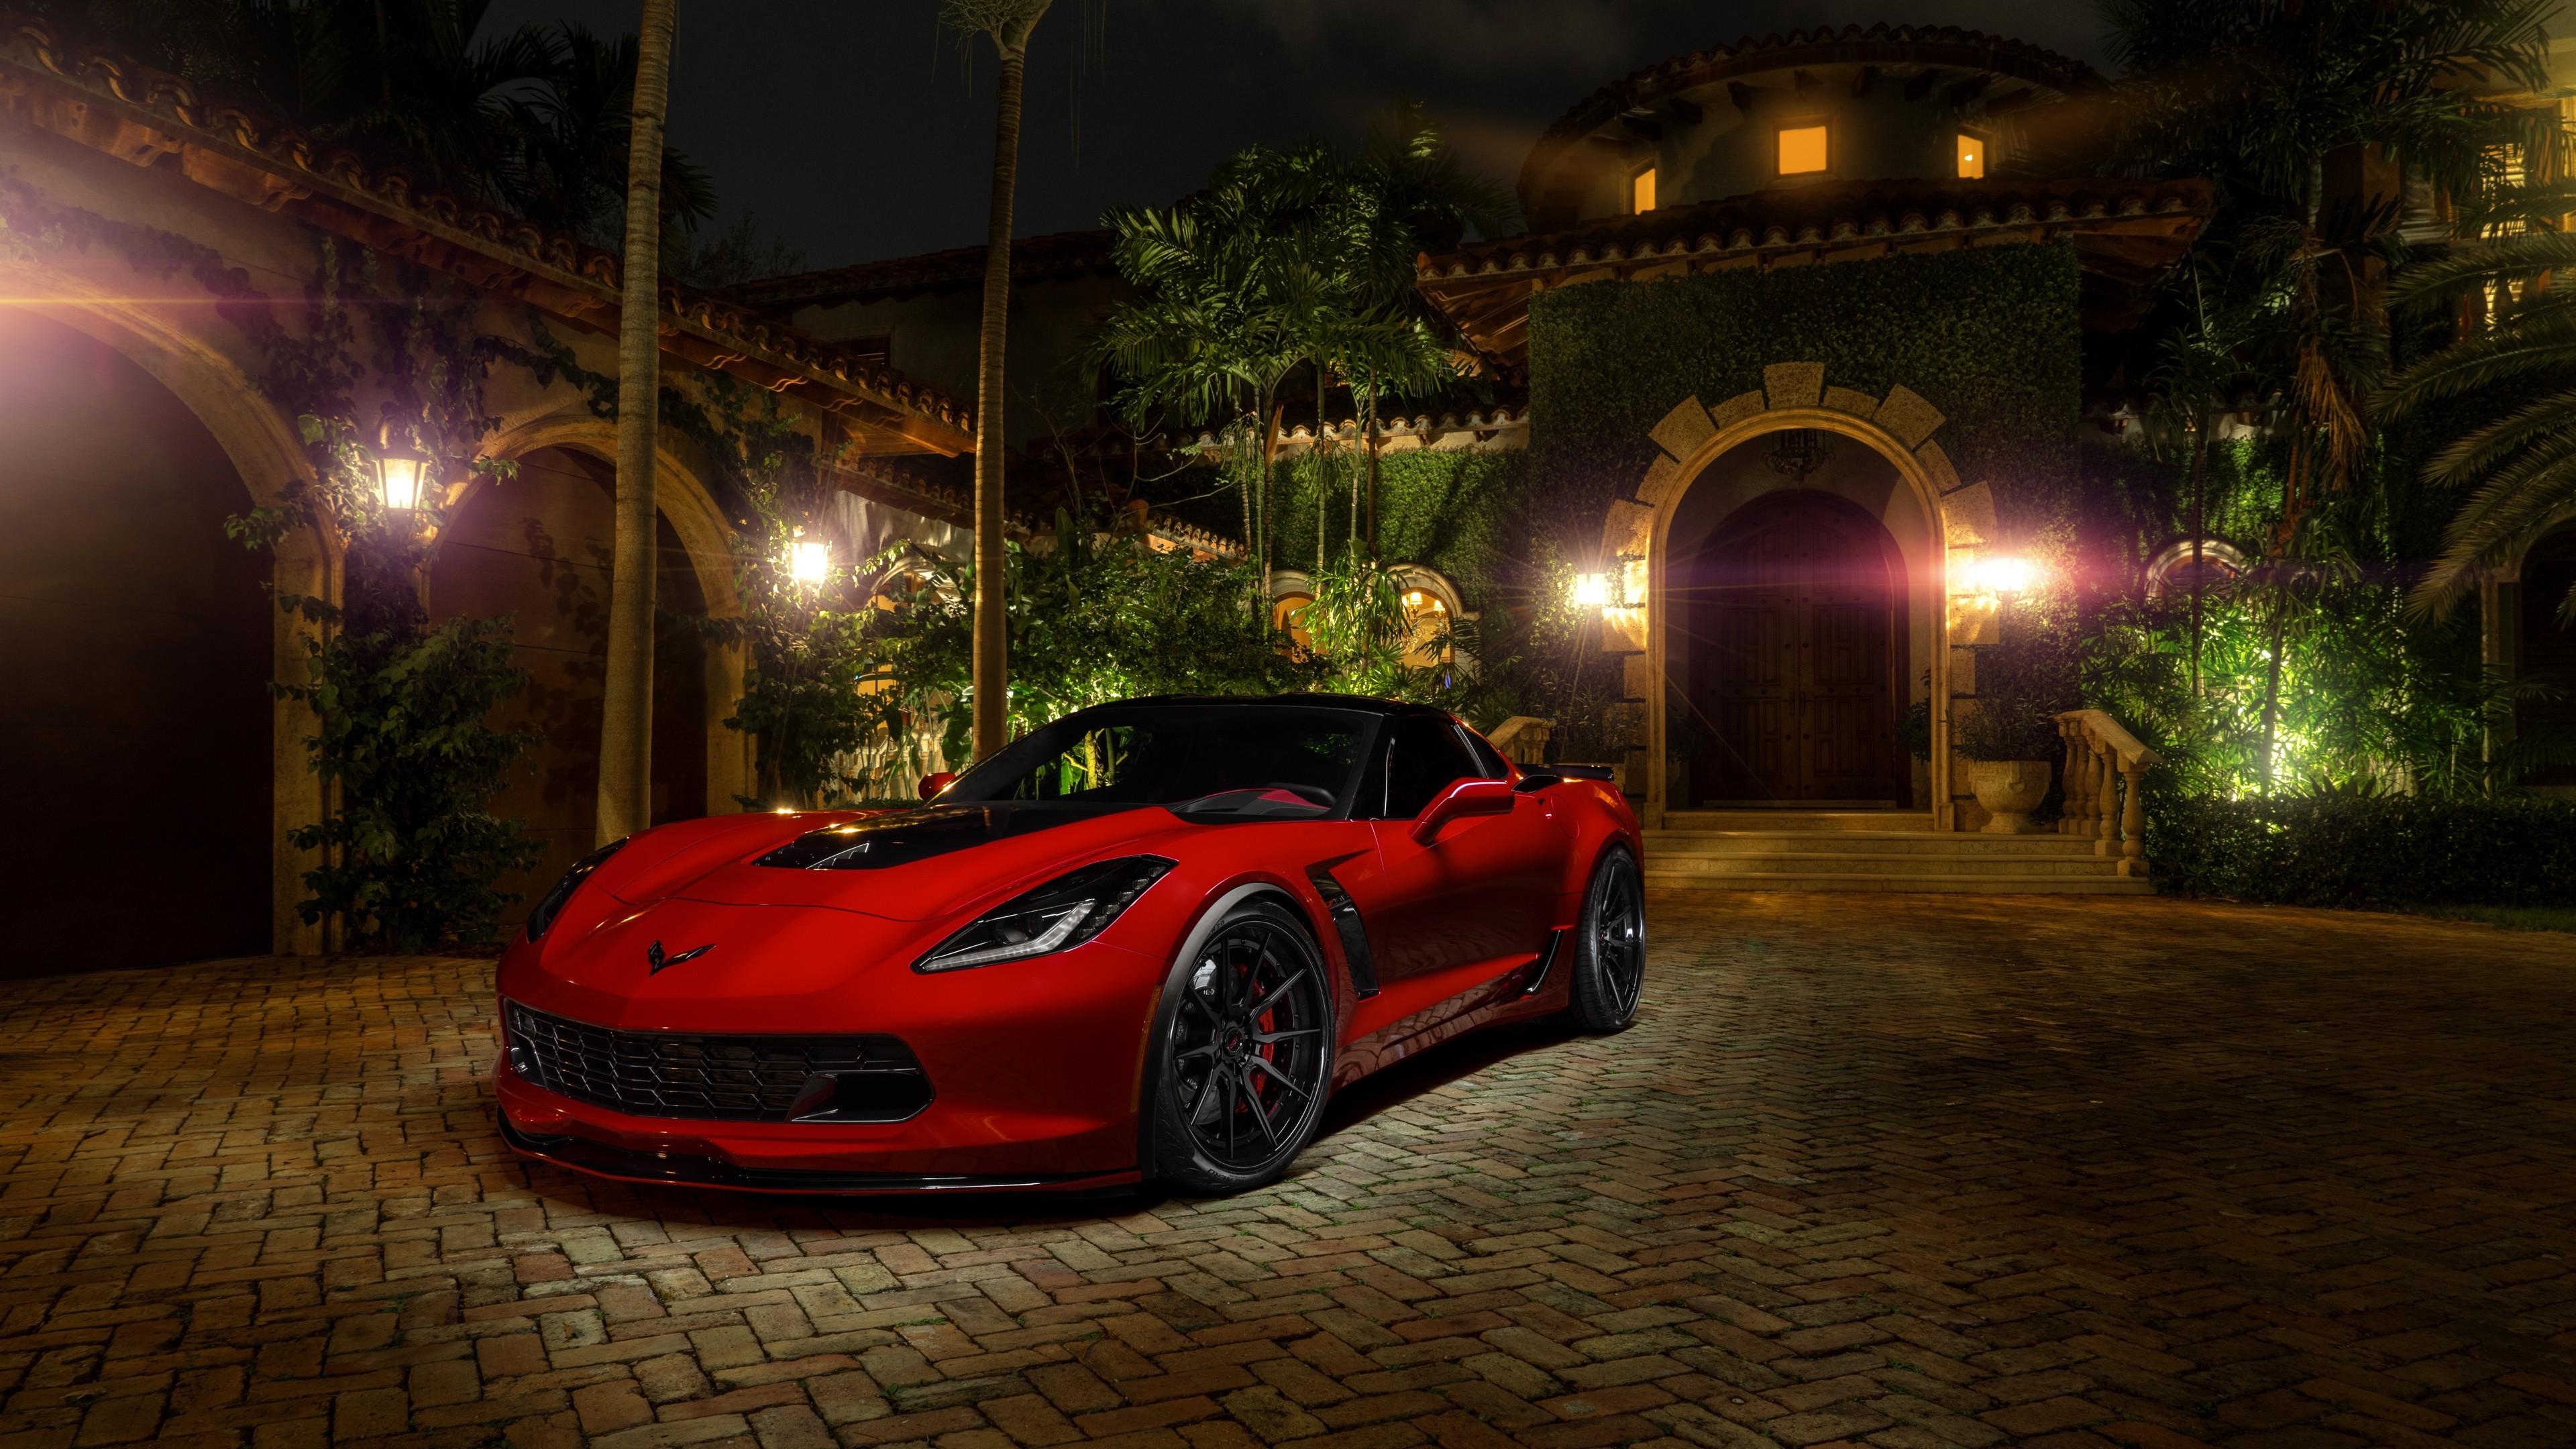 2560x1920 2014 Chevrolet Corvette Stingray Black